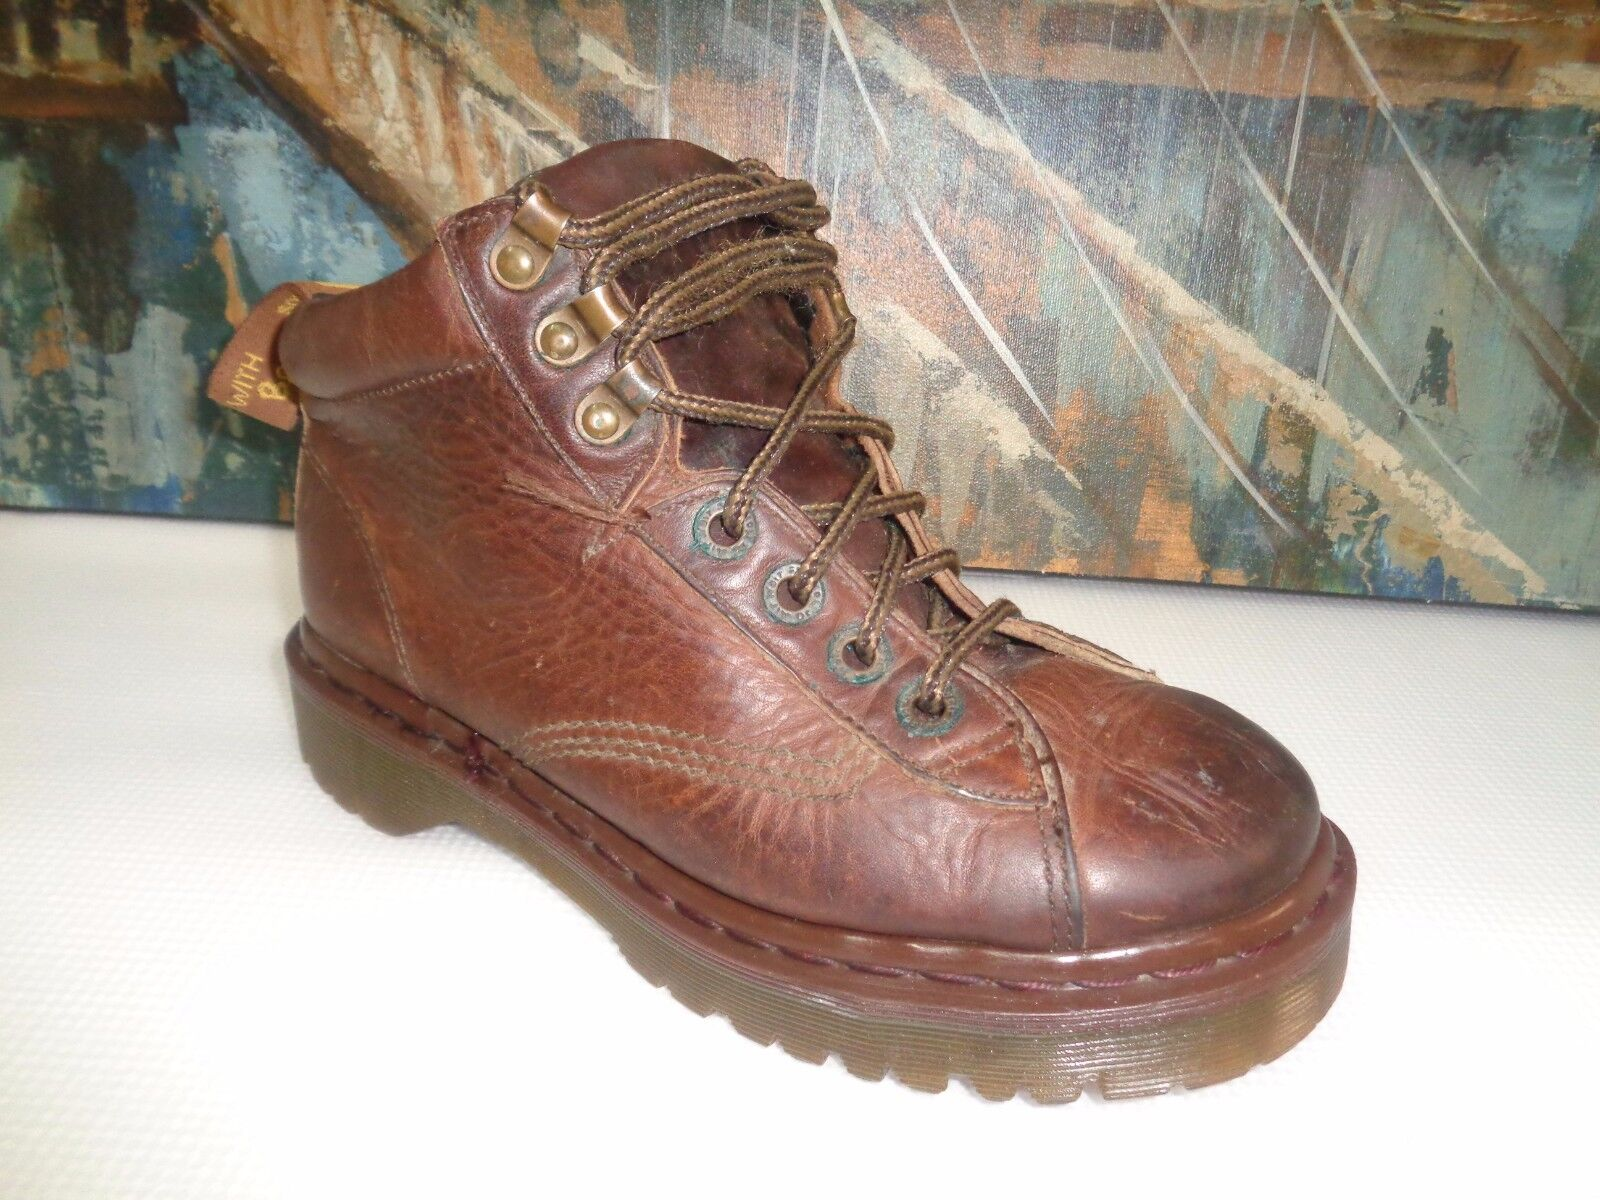 Dr Doc Martens 8287 Hiking Ankle Air Wair WomensUK sz 4.5-5  US 6.5-7